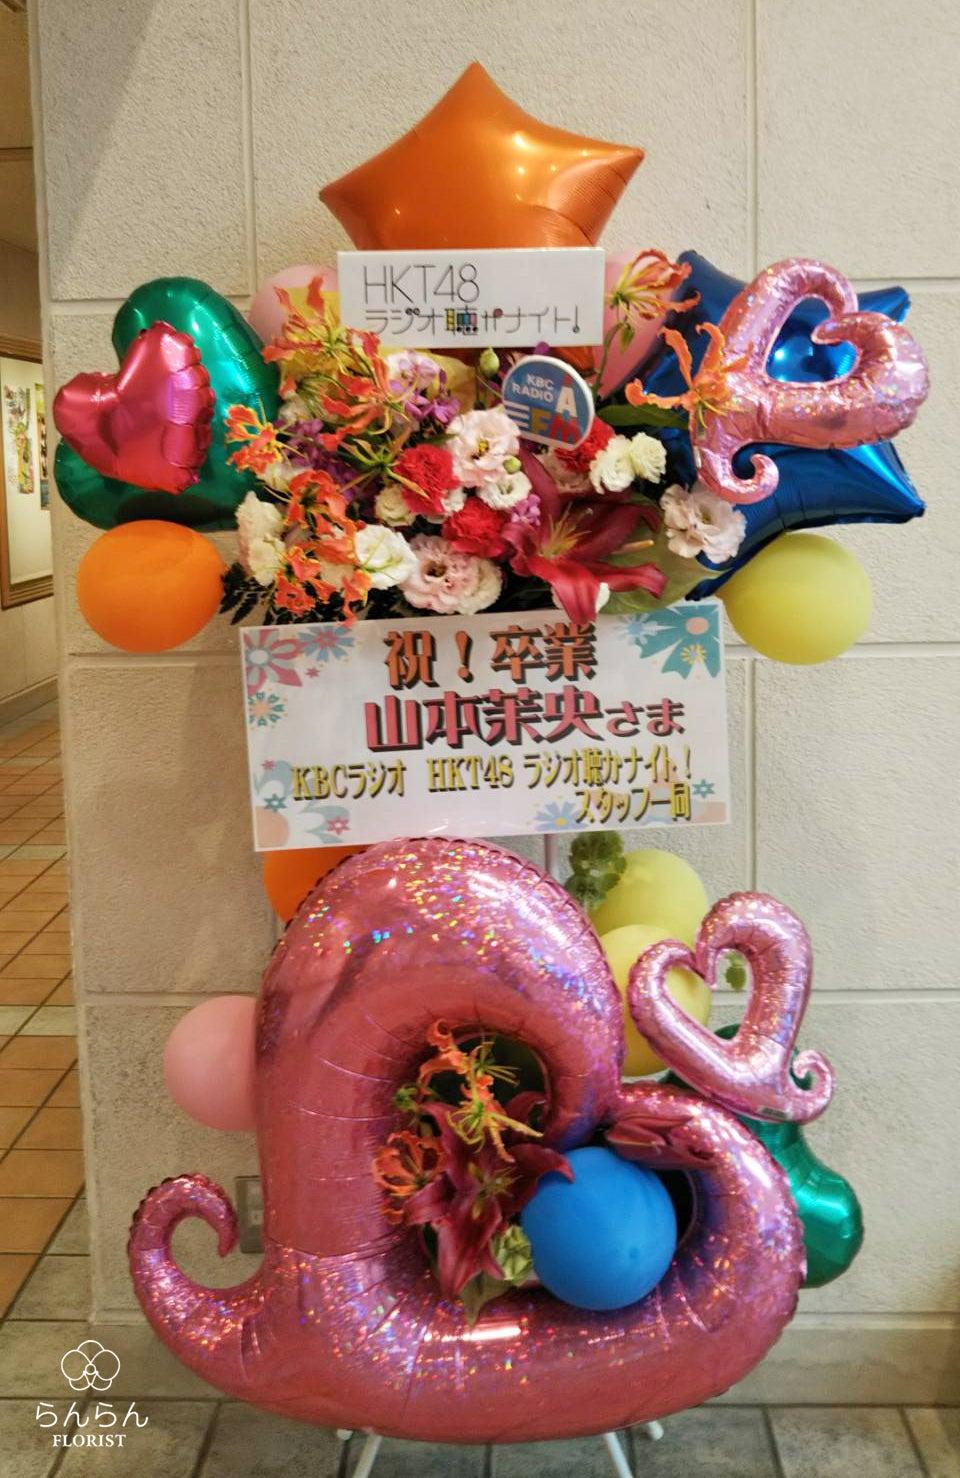 HKT48 バルーンスタンド花